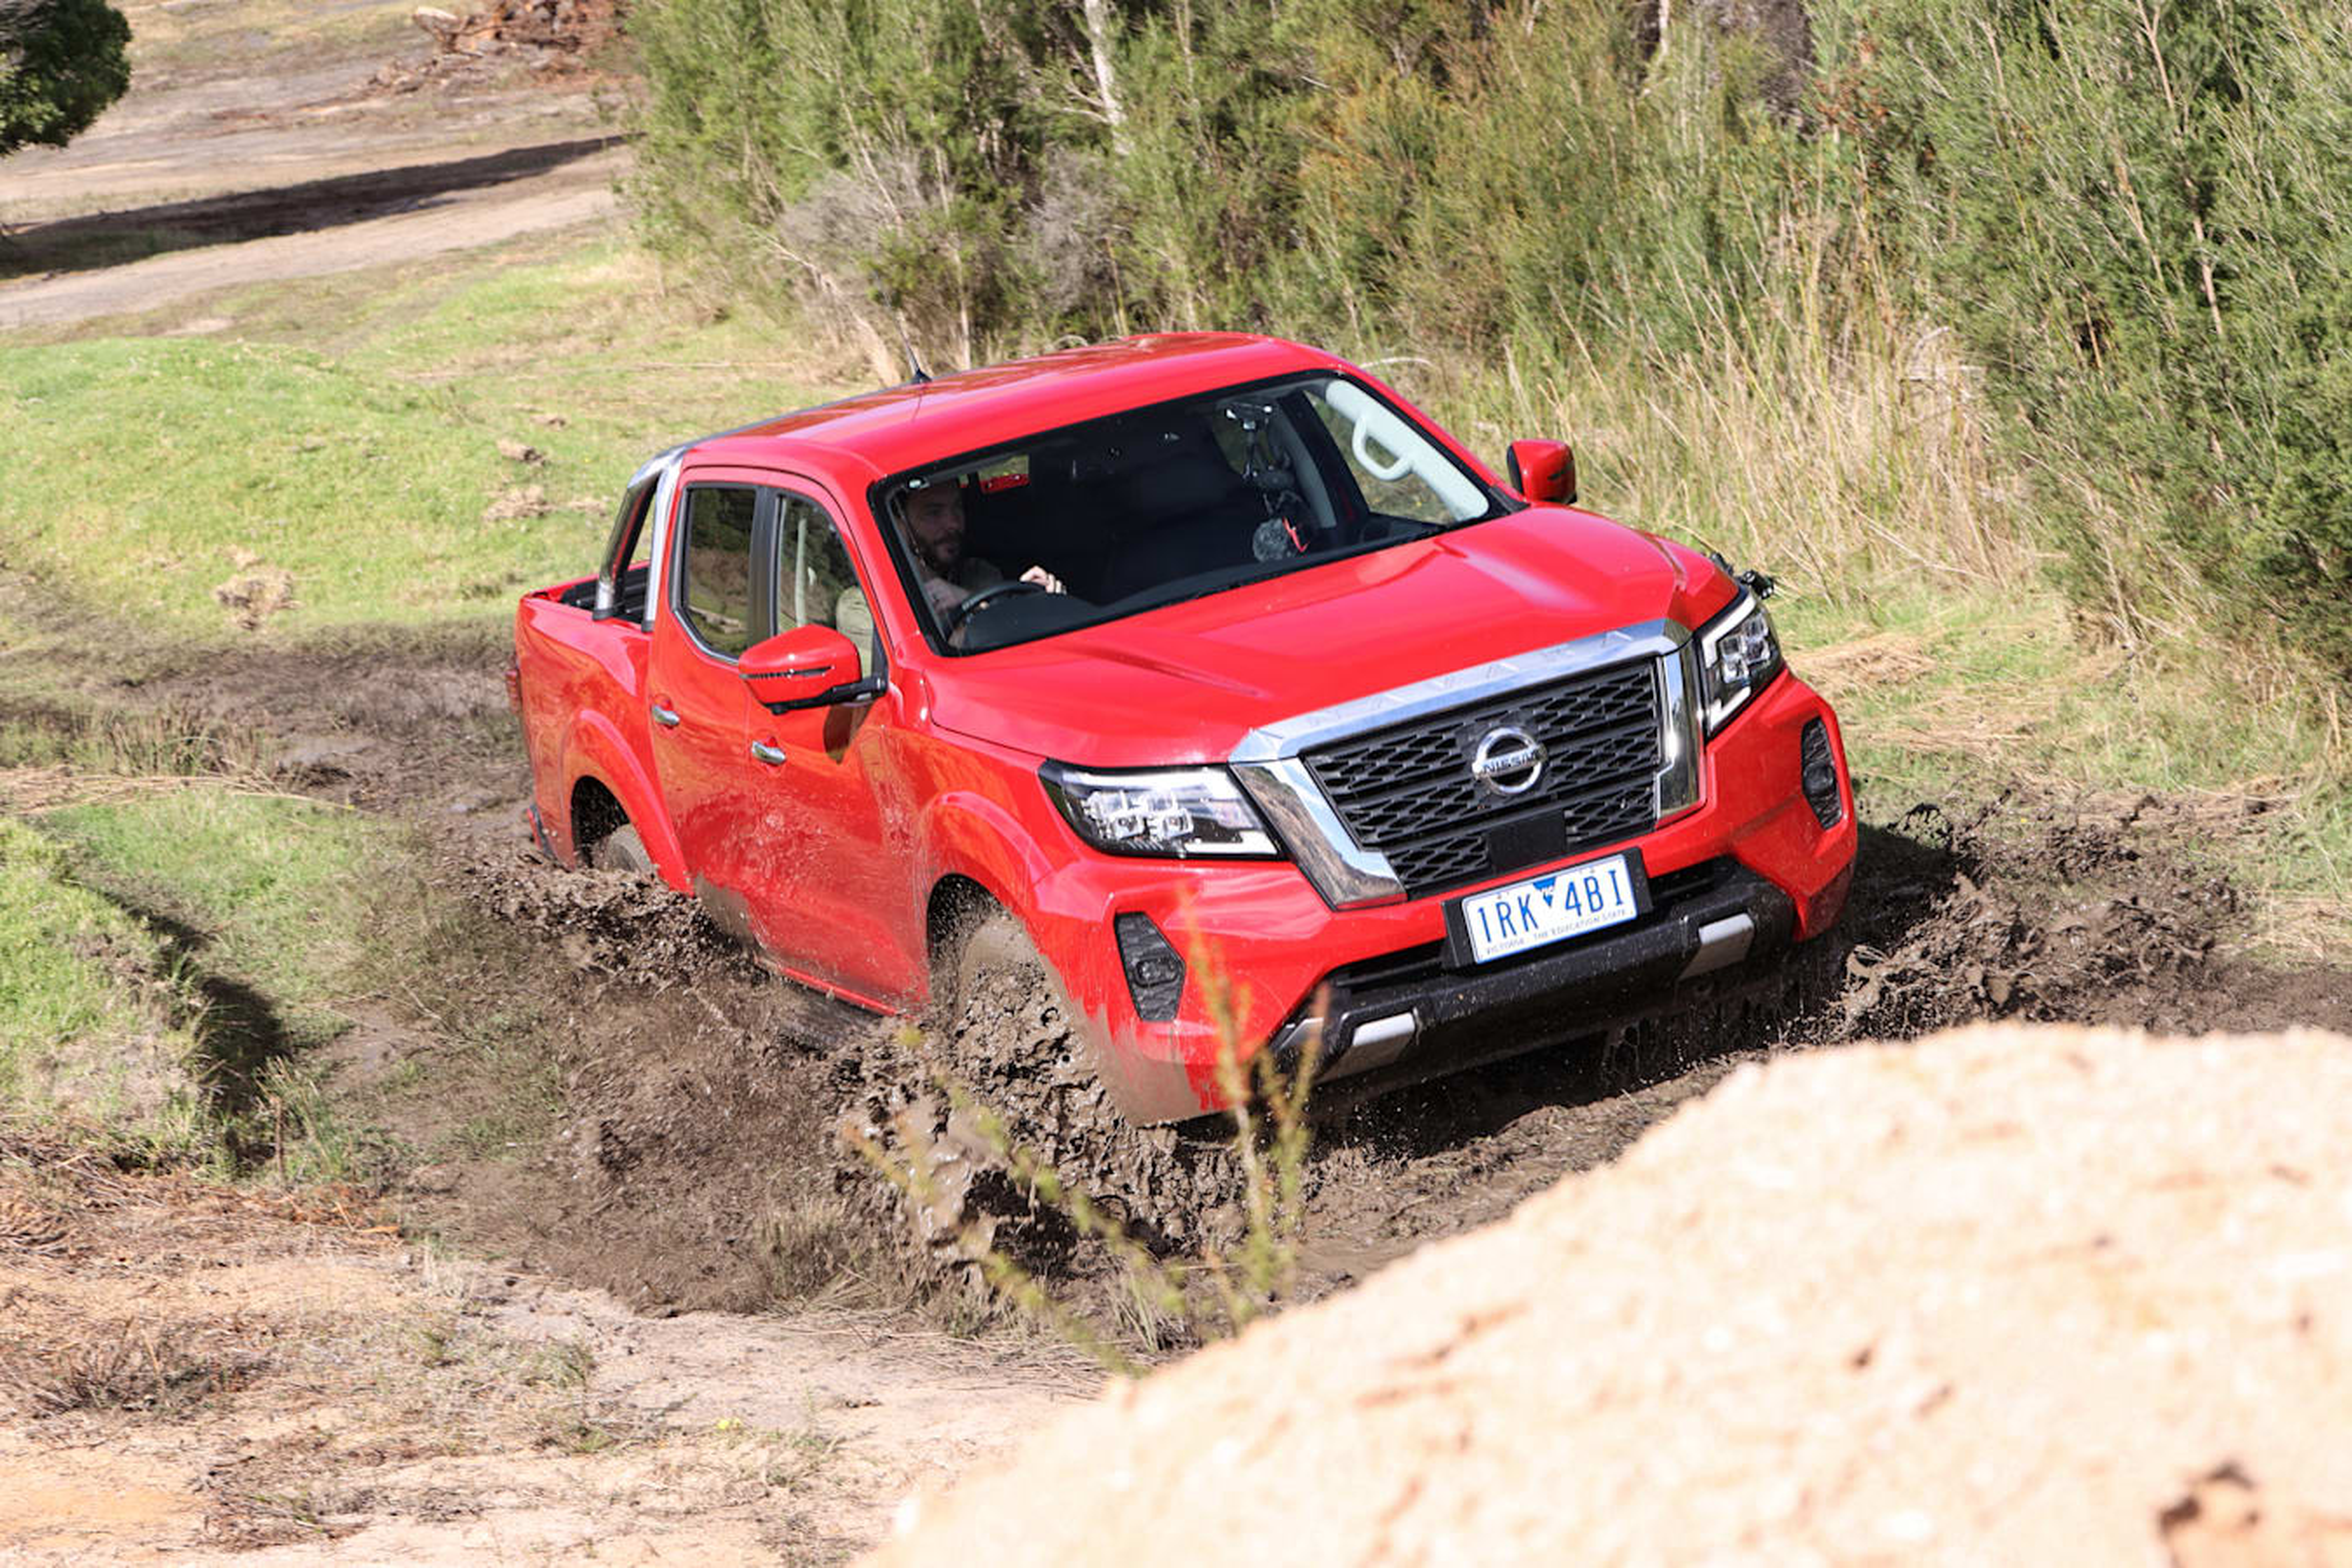 4 X 4 Australia Comparisons 2021 May 21 Nissan Navara ST X Off Road Handling